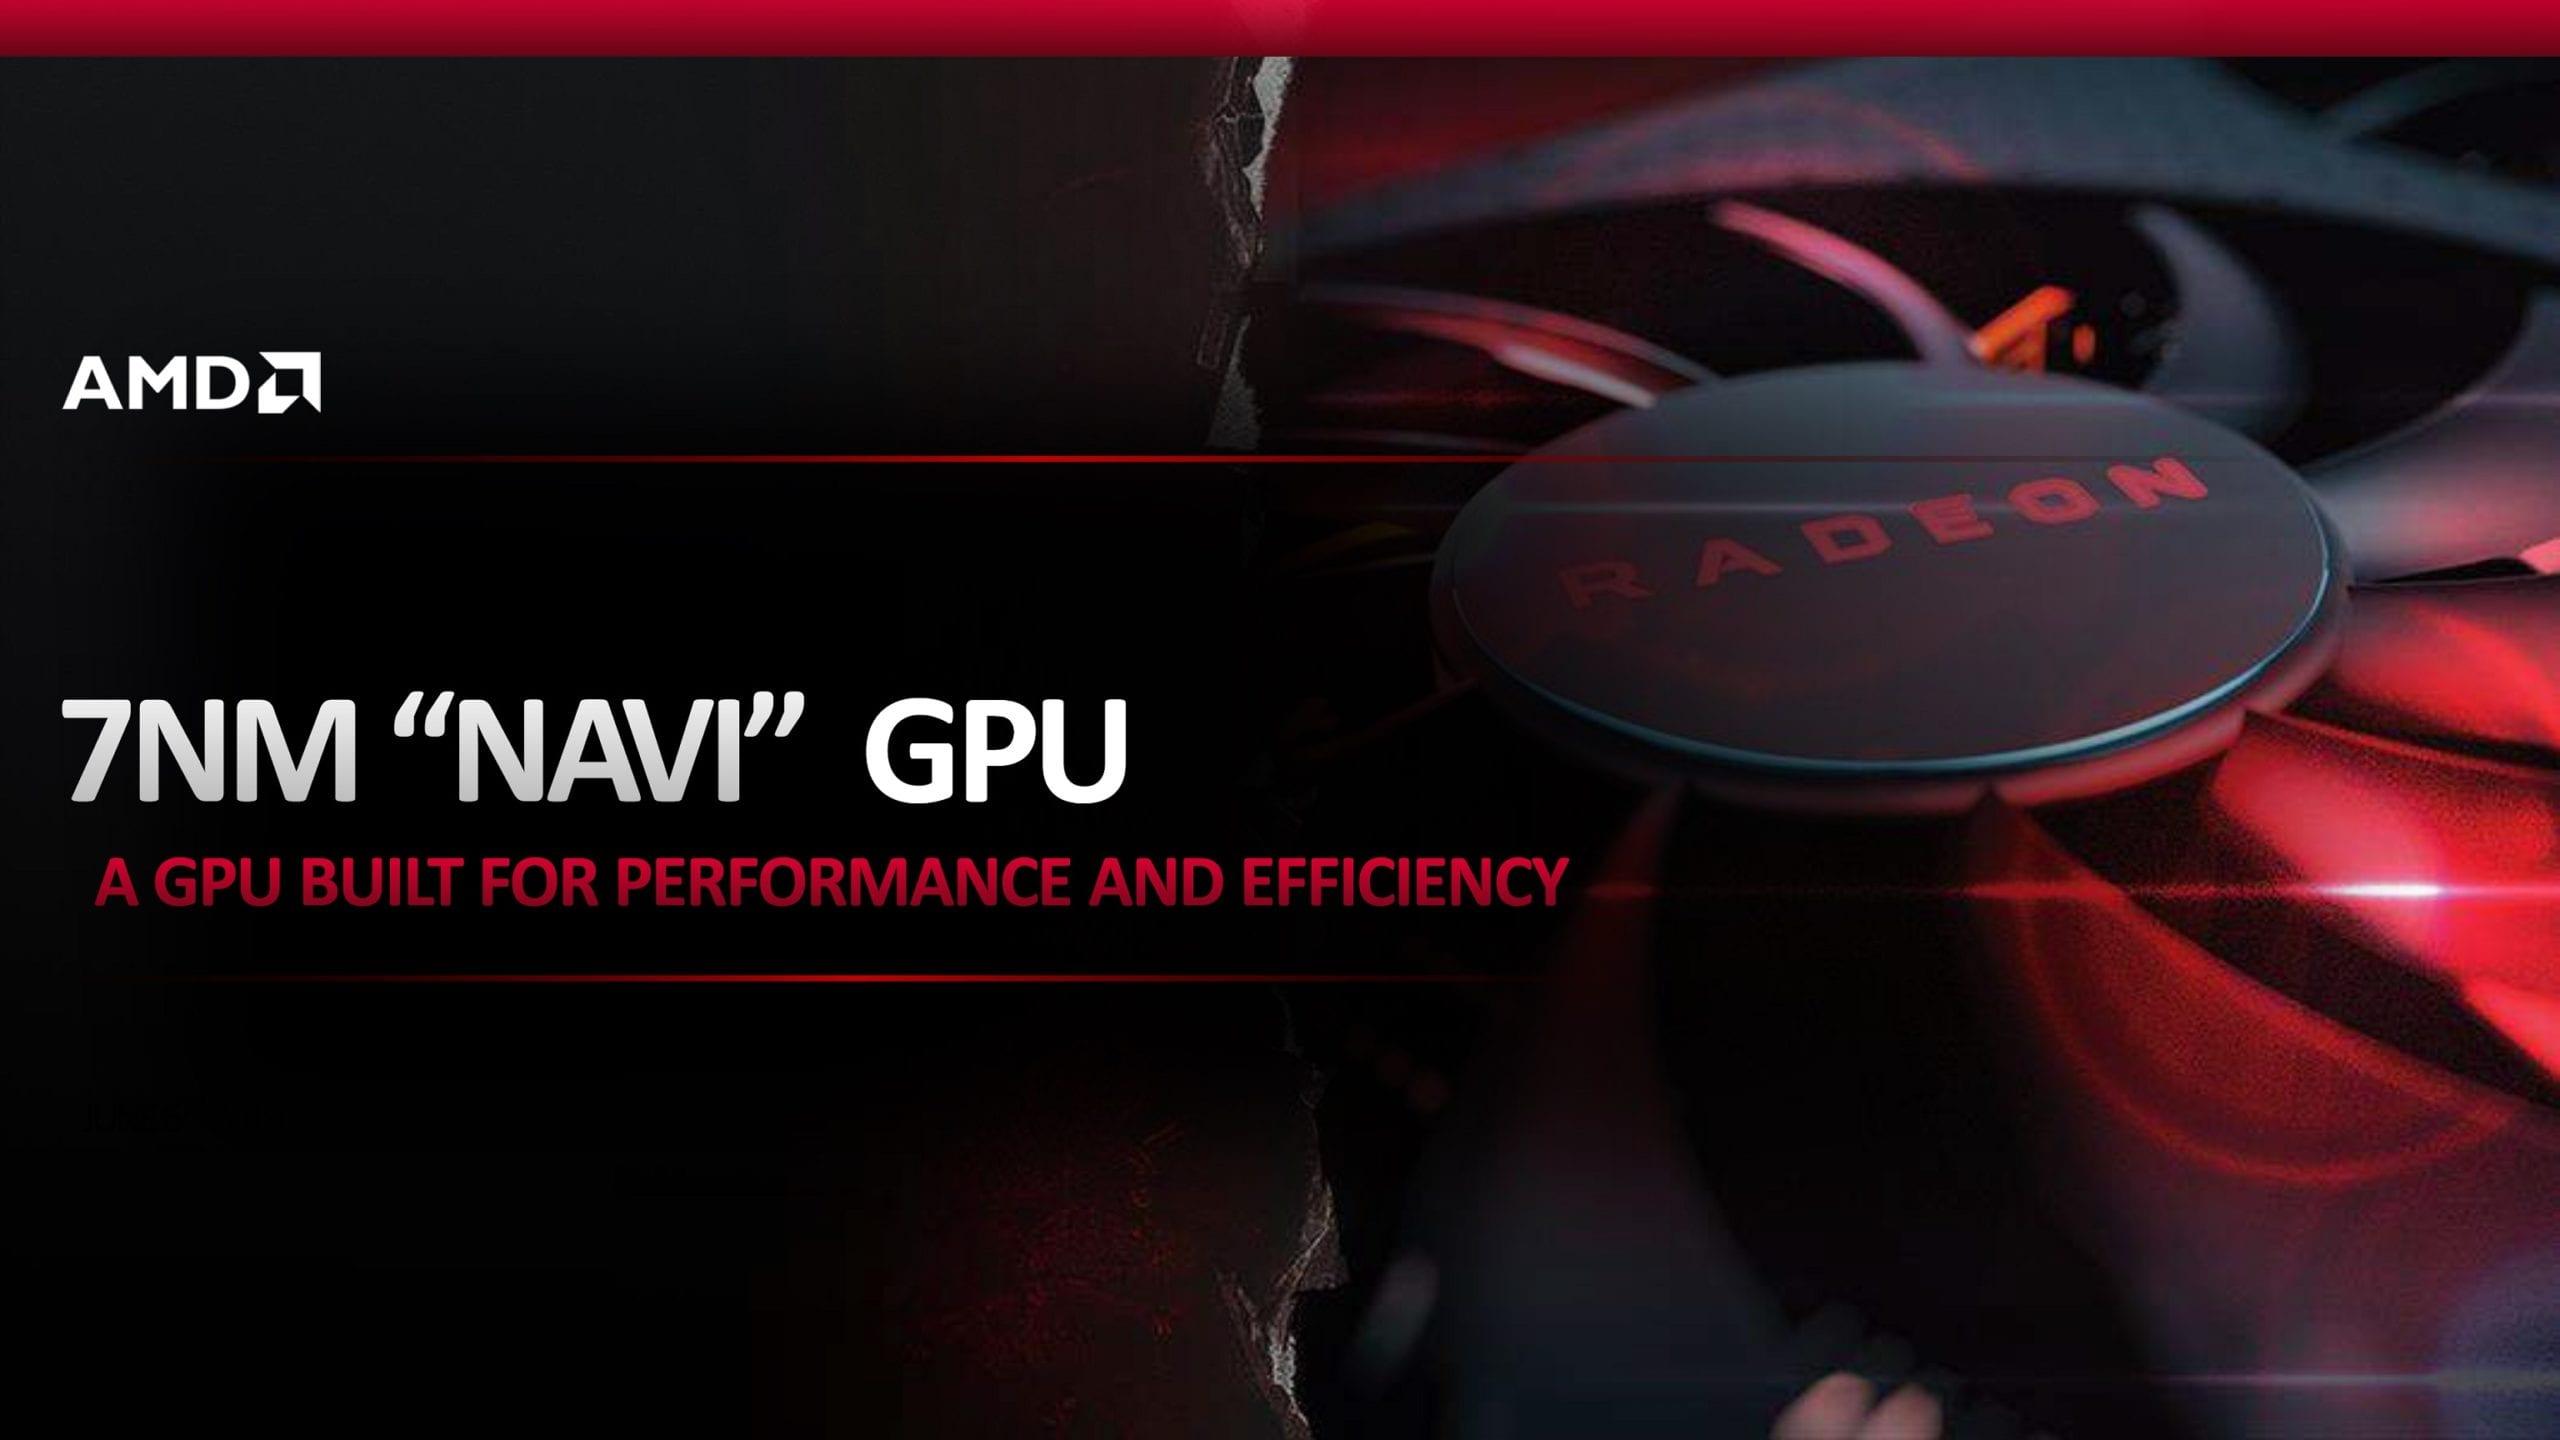 Неизвестная видеокарта AMD Radeon RX оказалась на 17% производительнее NVIDIA GeForce RTX 2080 Ti